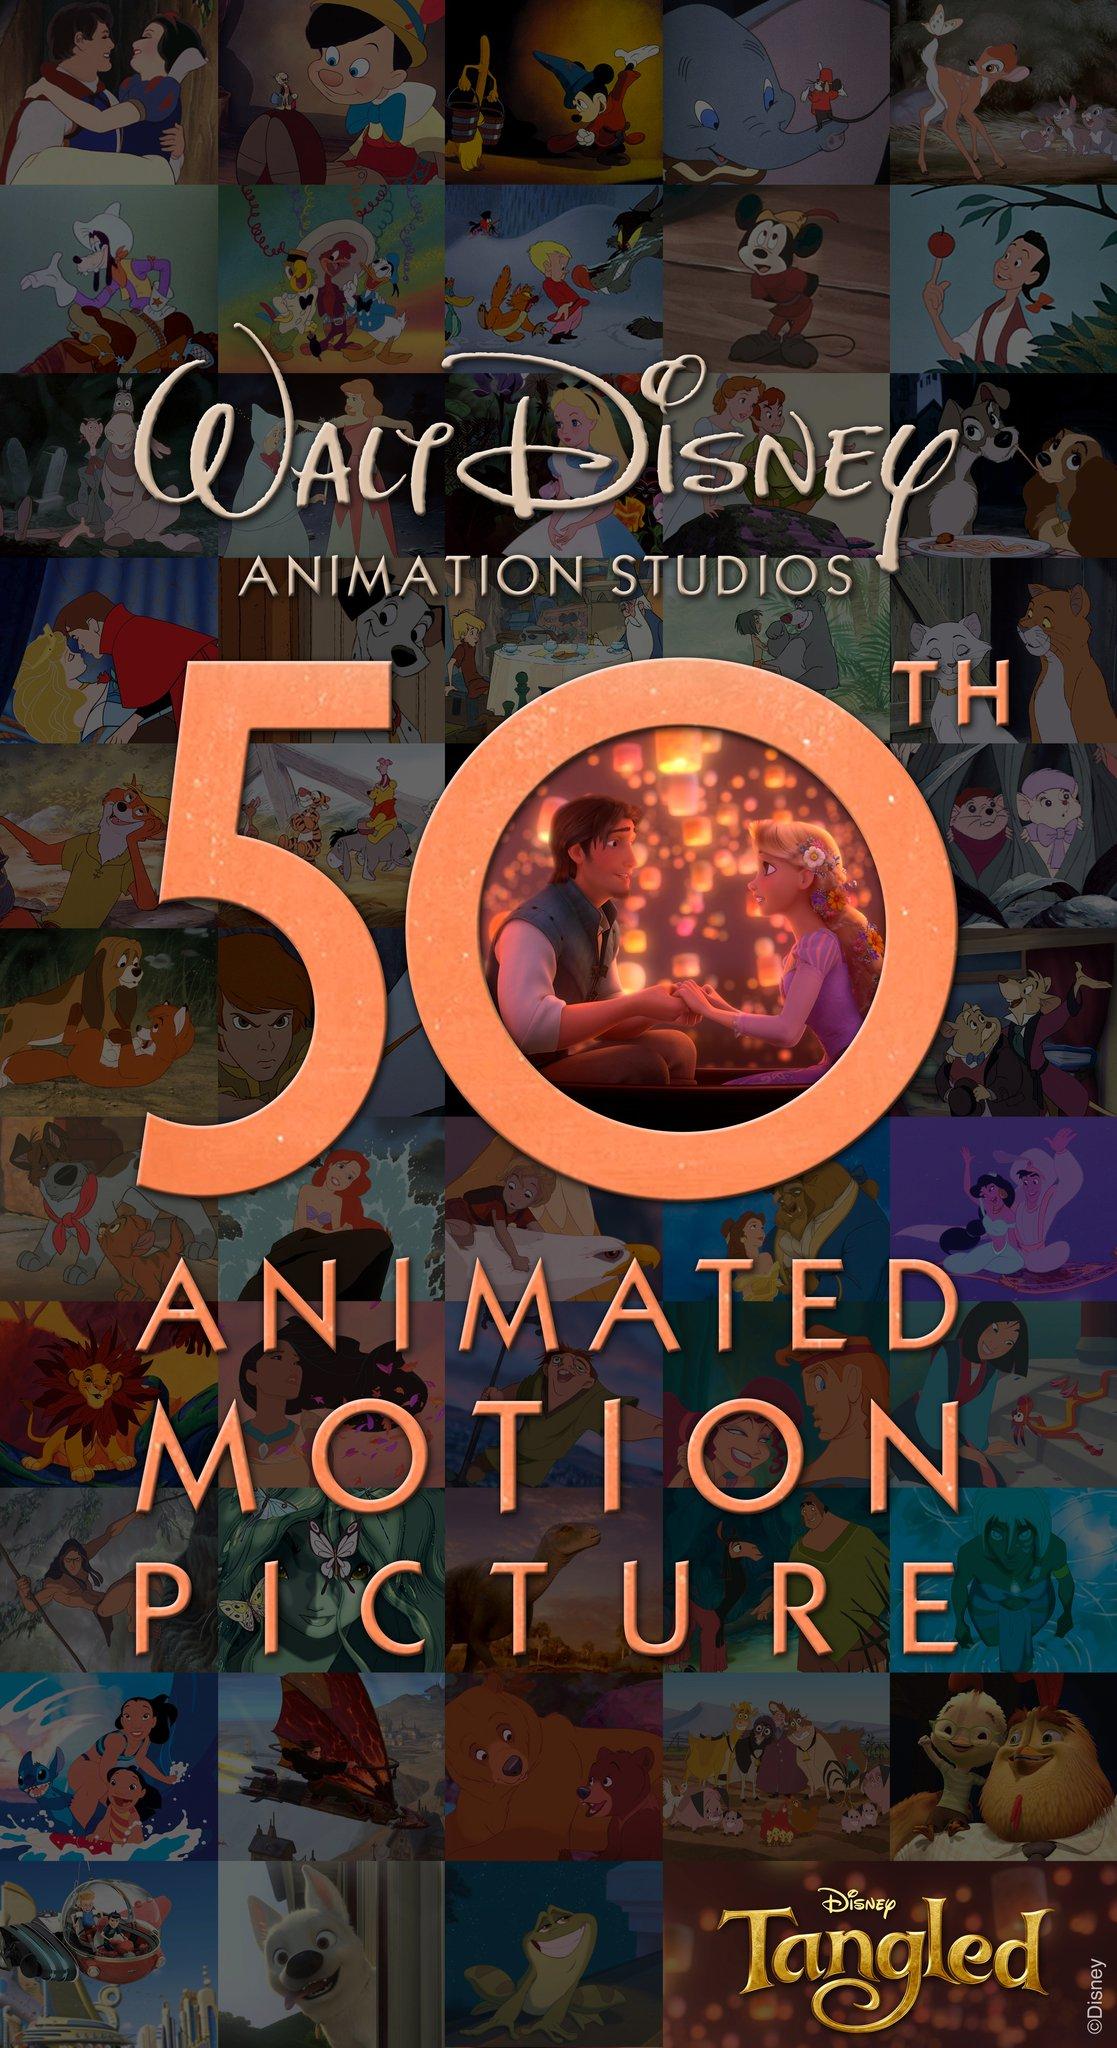 How walt disney revolutionized the world of animation